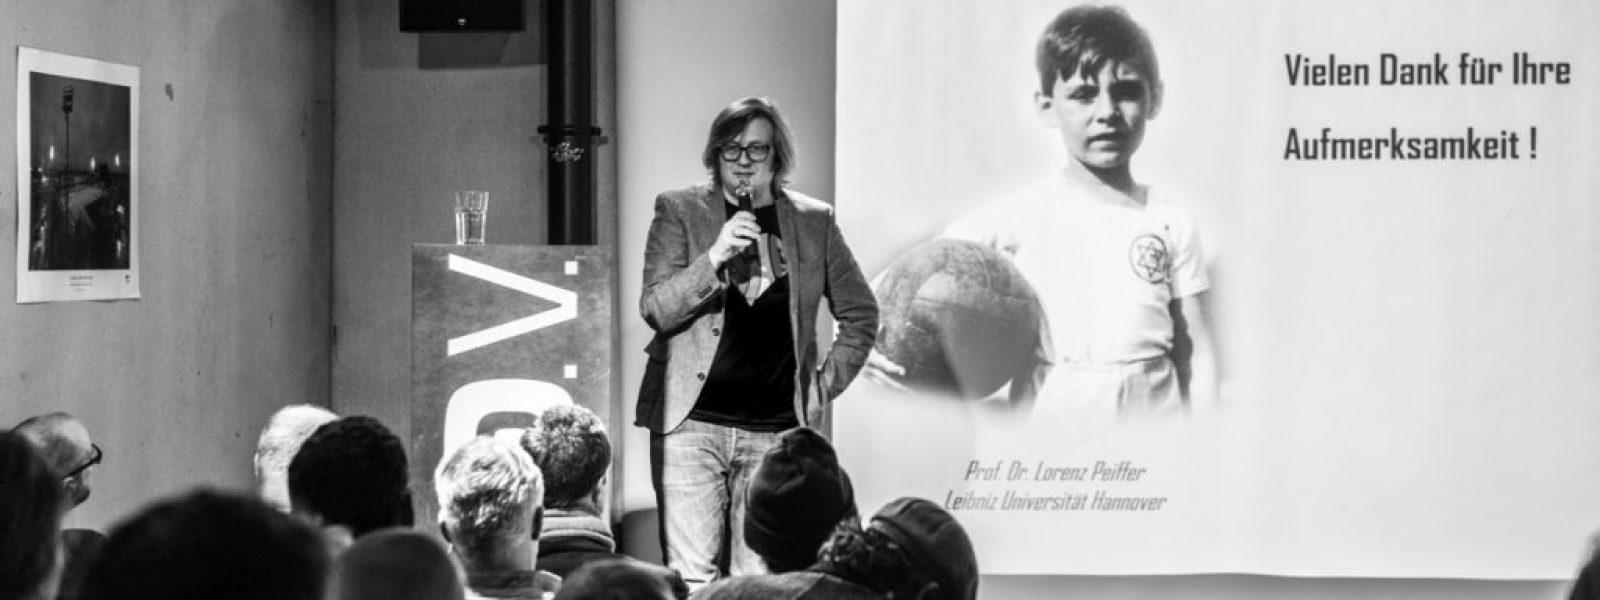 Vernissage F3R-Ausstellung (Foto Sabrina Adeline Nagel) - 14